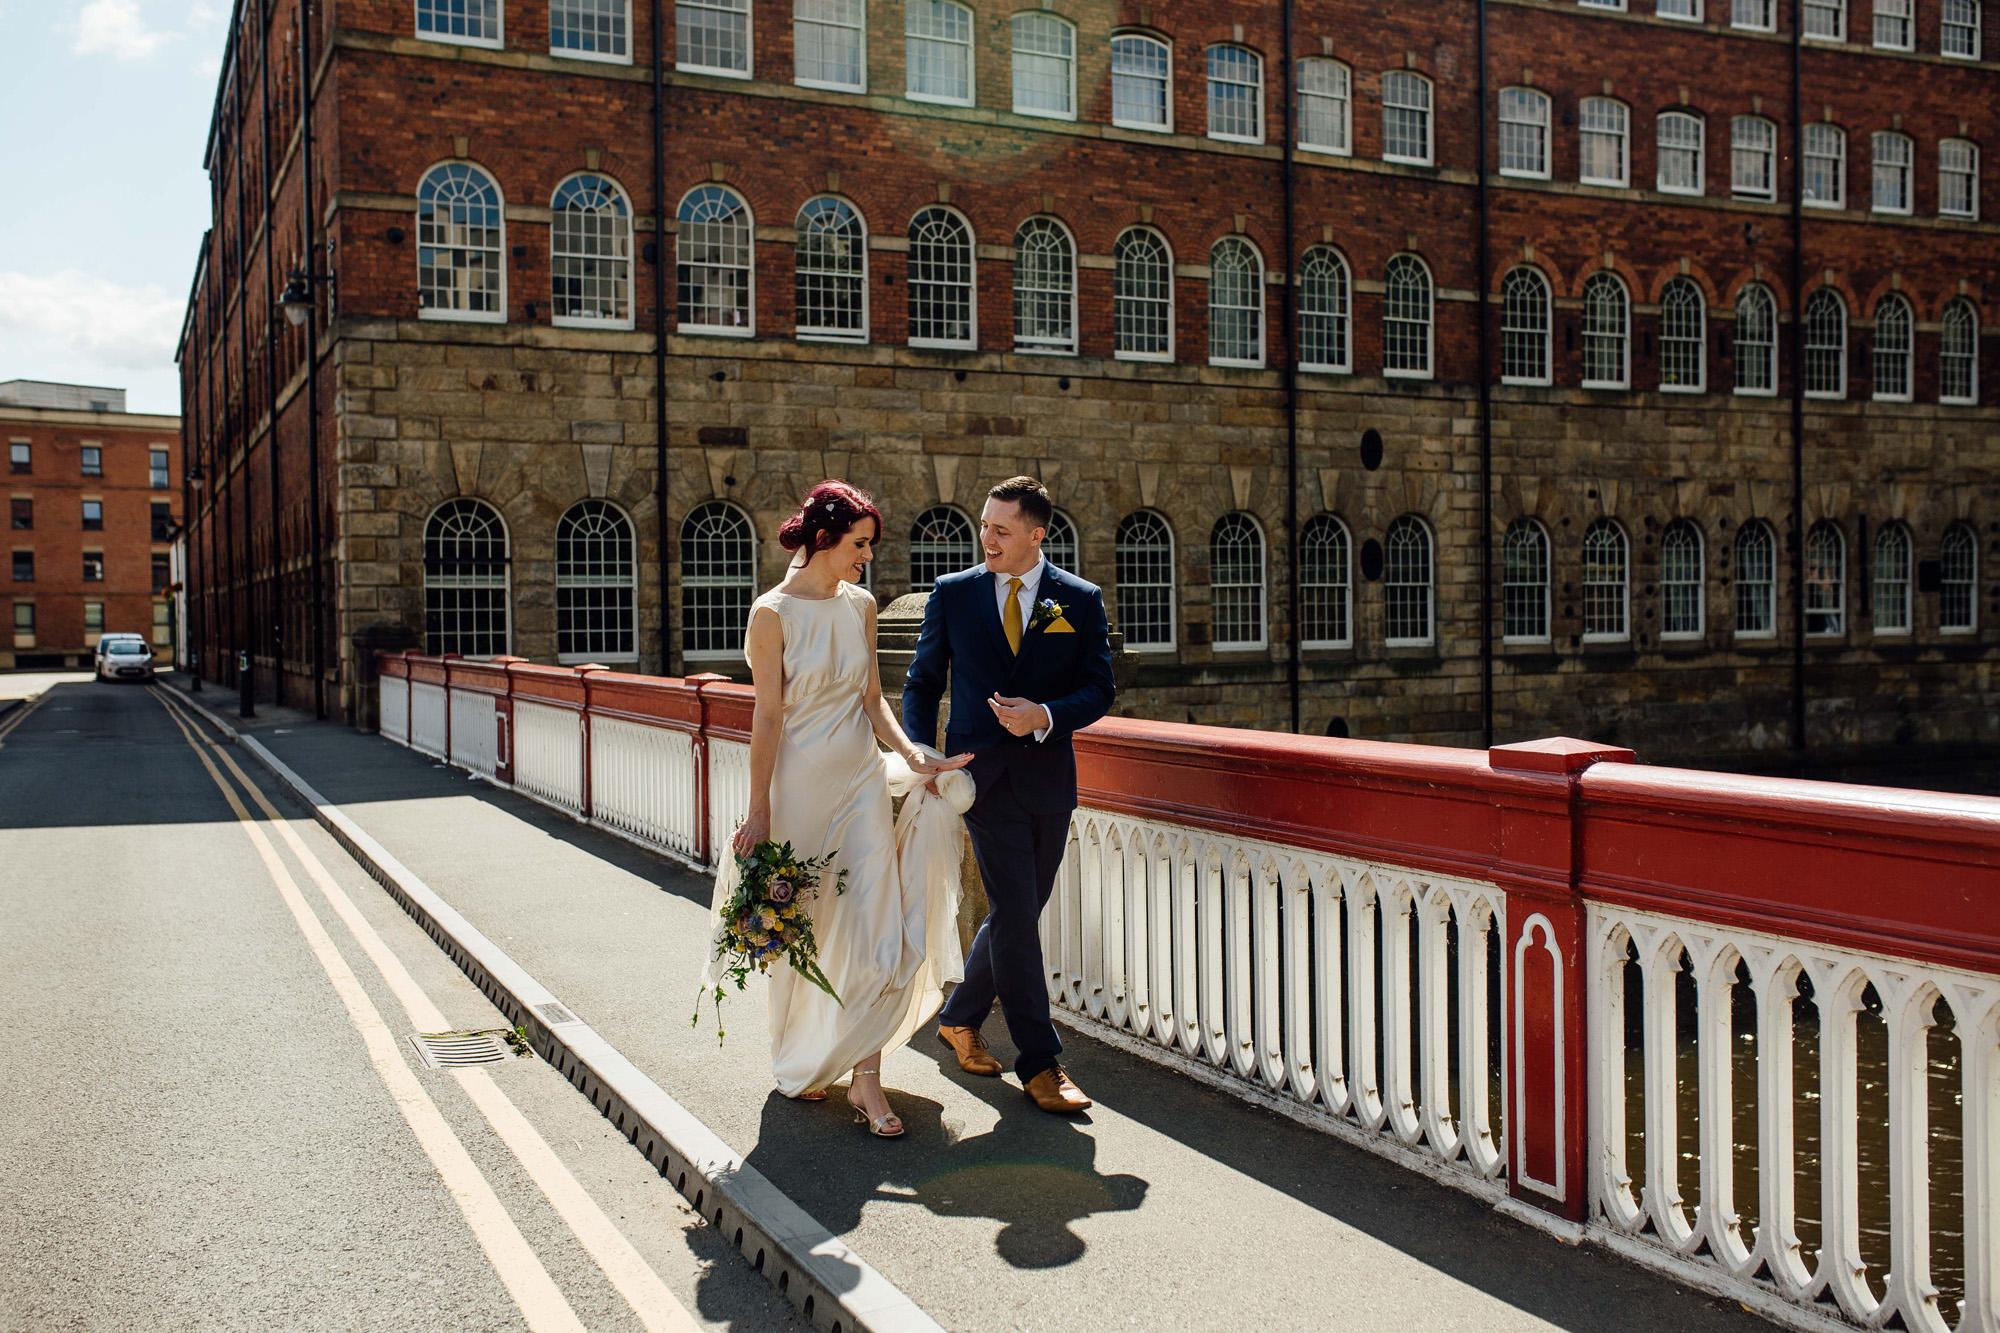 Sarah-Honeysuckle-Bias-Cut-Silk-Vintage-Inspired-Wedding-Gown-Sheffield-Wedding-Kate-Beaumont-32.jpg